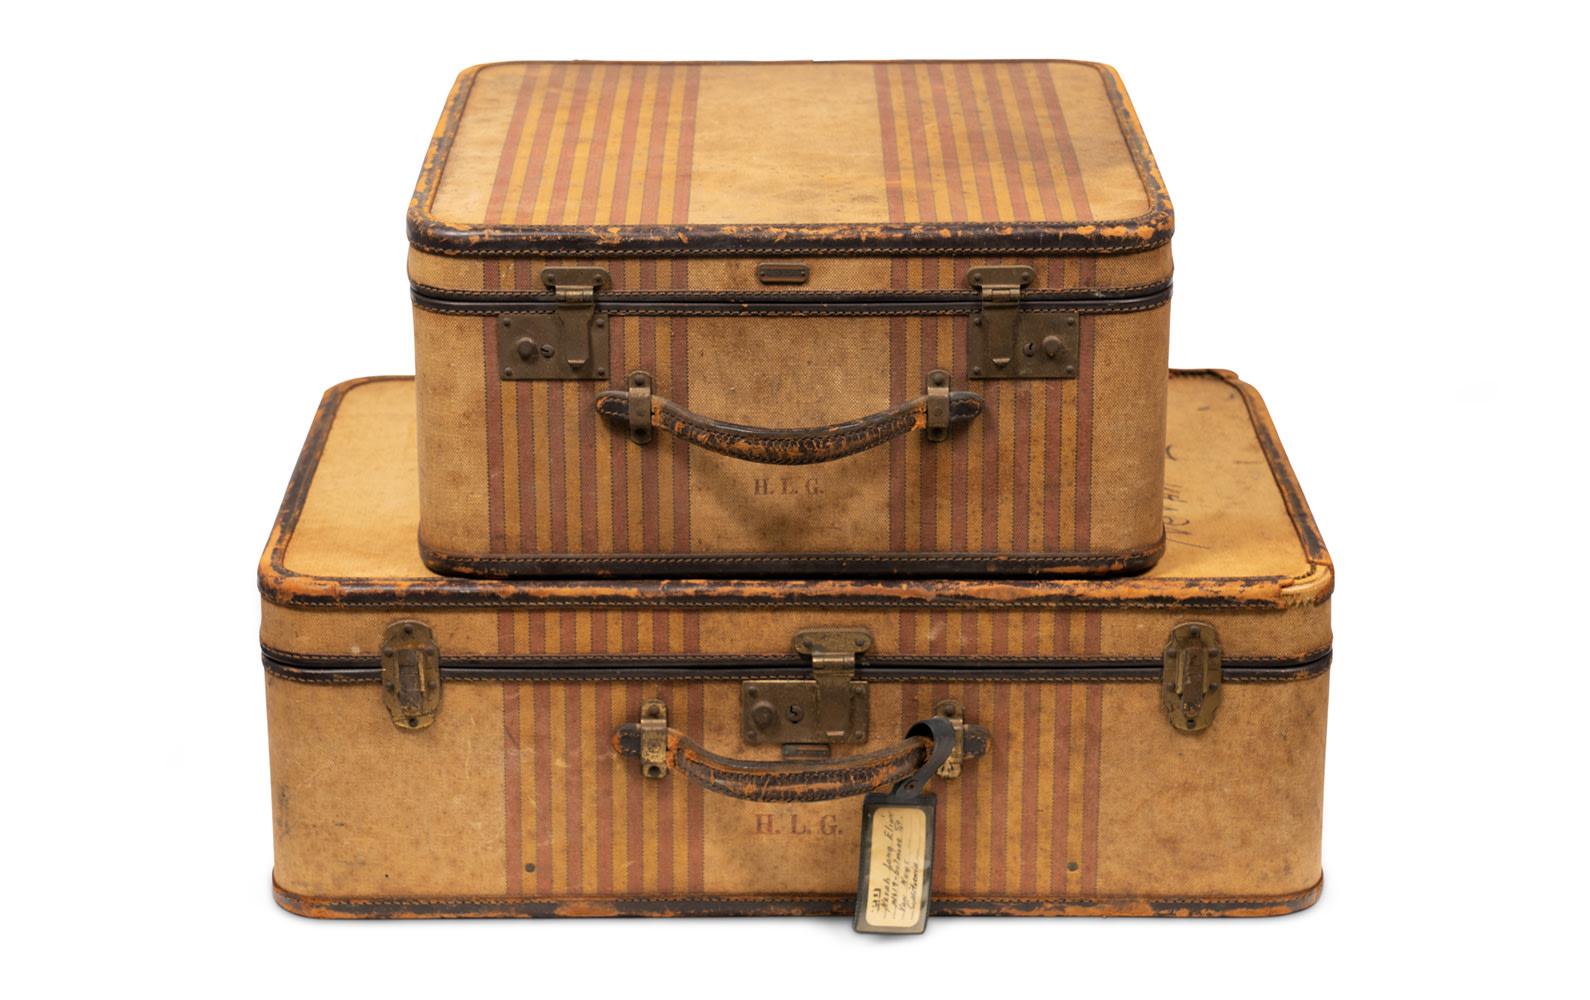 Oshkosh Trunks Two-Piece Personal Luggage Set